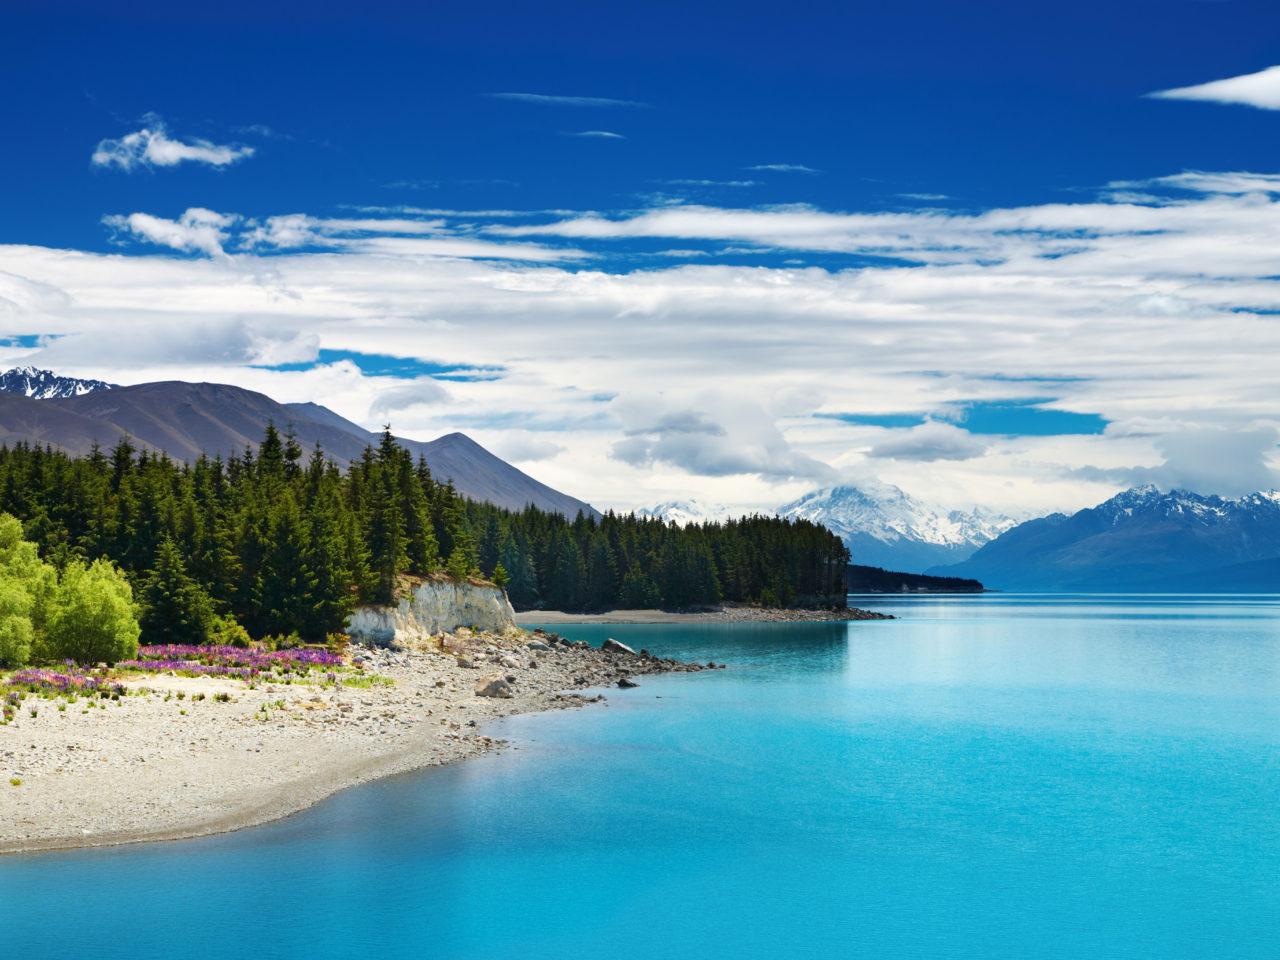 Usa Hd Wallpaper Download Mount Cook And Lake Pukaki New Zealand Beautiful Hd